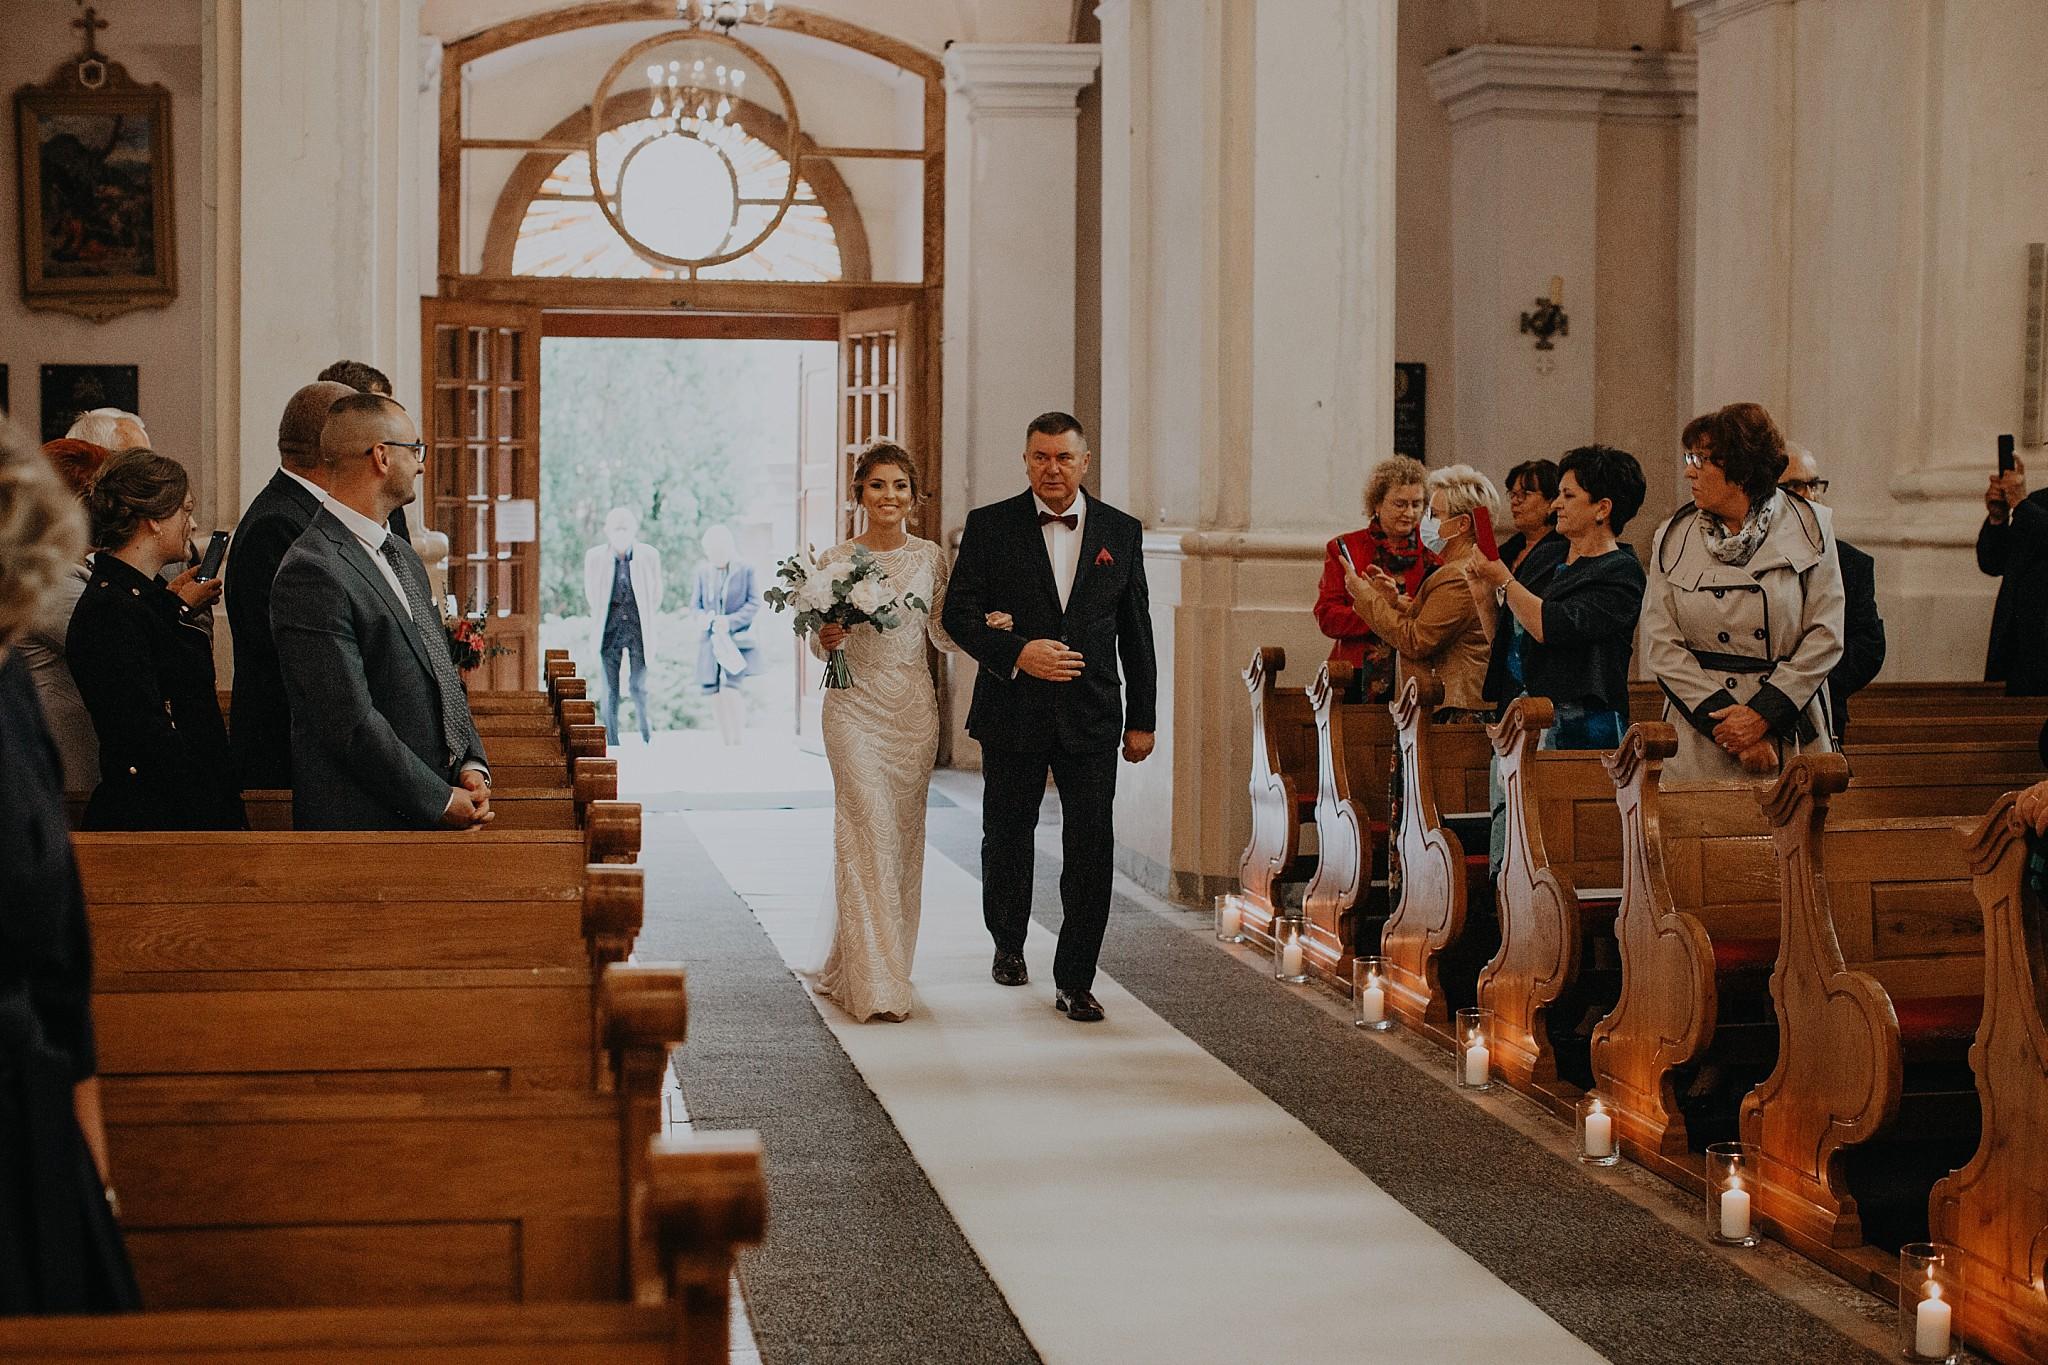 fotograf poznan wesele dobra truskawka piekne wesele pod poznaniem wesele w dobrej truskawce piekna para mloda slub marzen slub koronawirus slub listopad wesele koronawirus 148